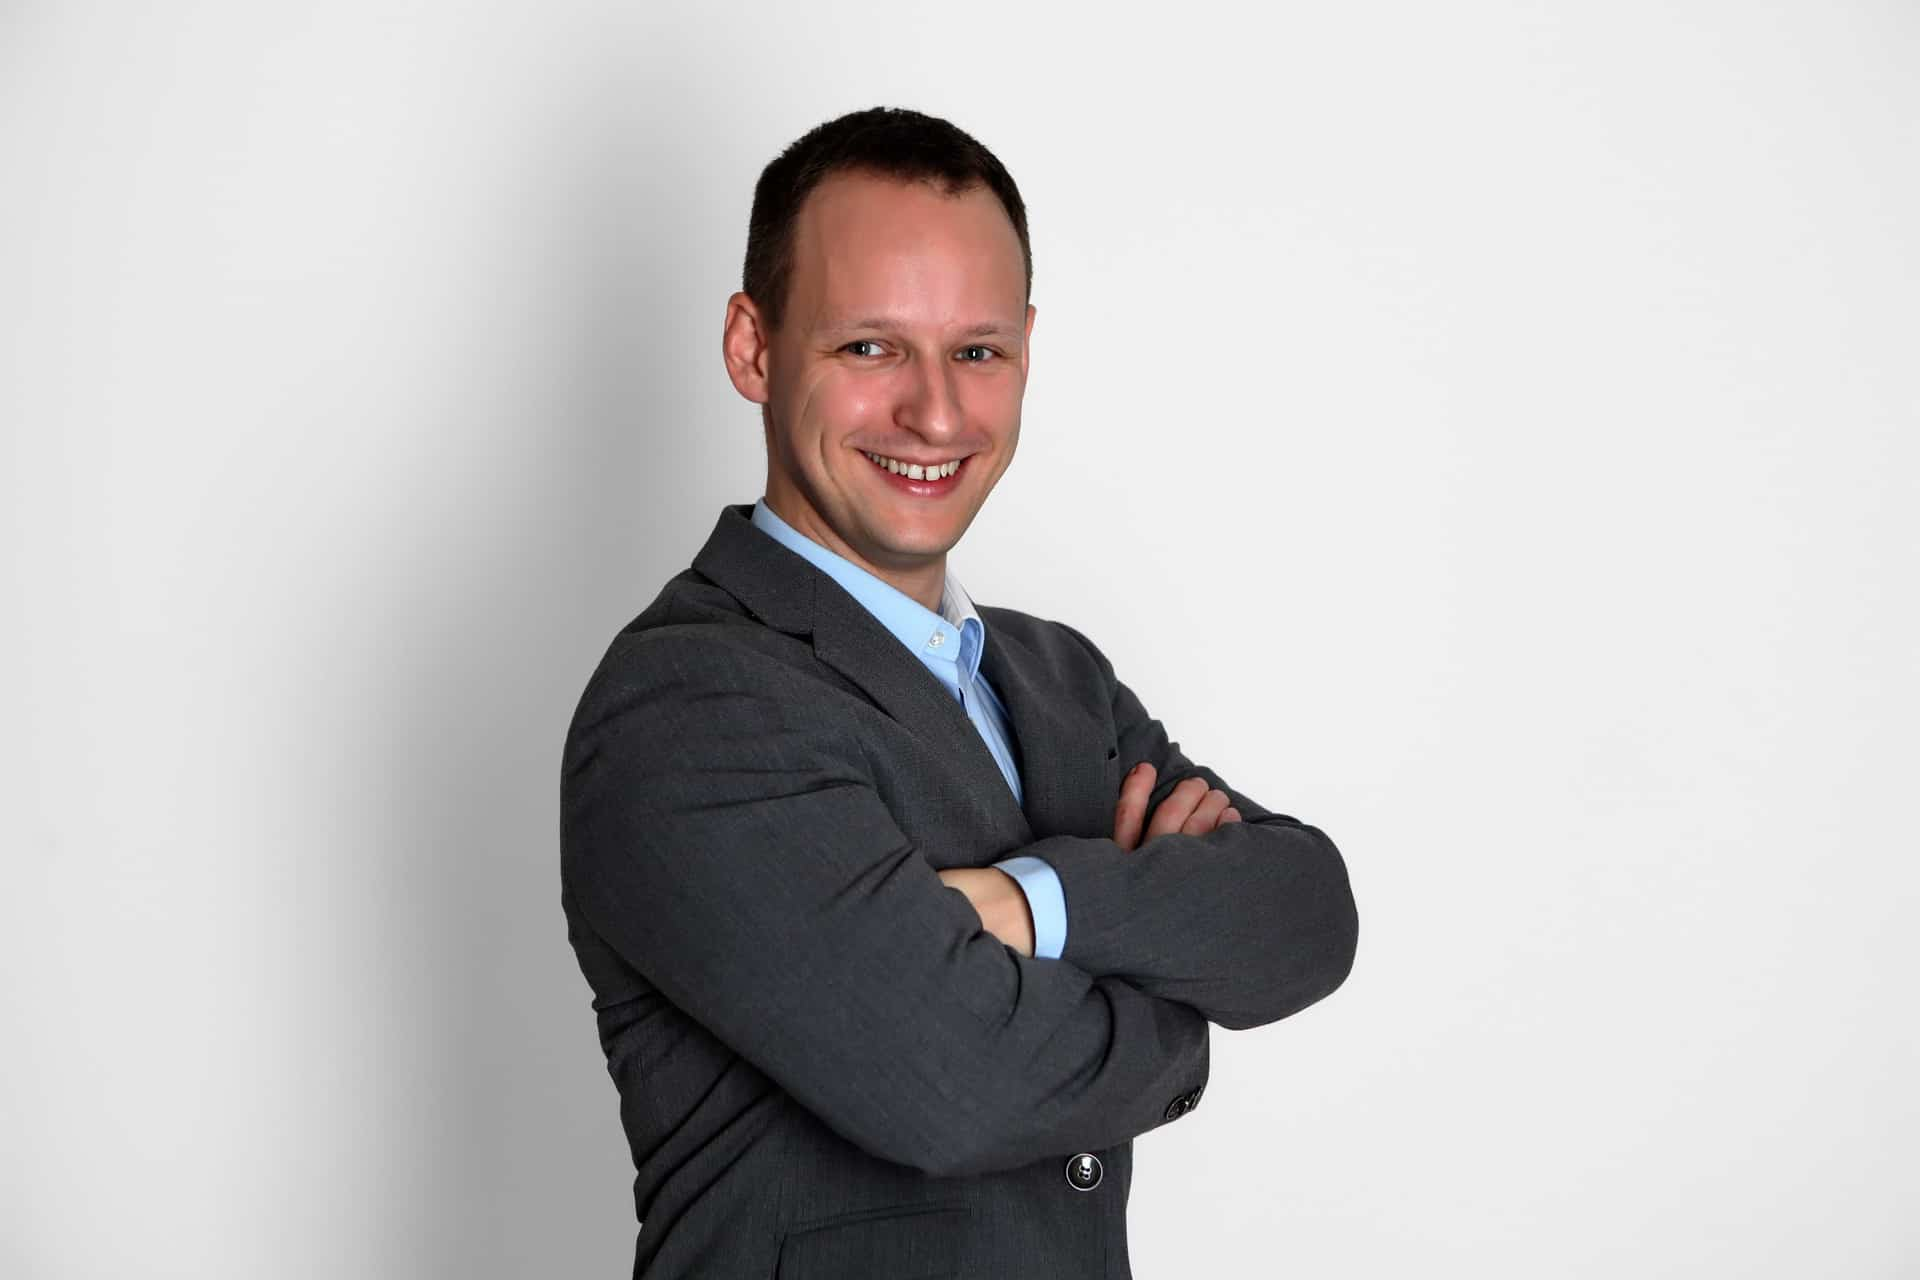 Kovács Gergő - Klinikai szakpszichológus